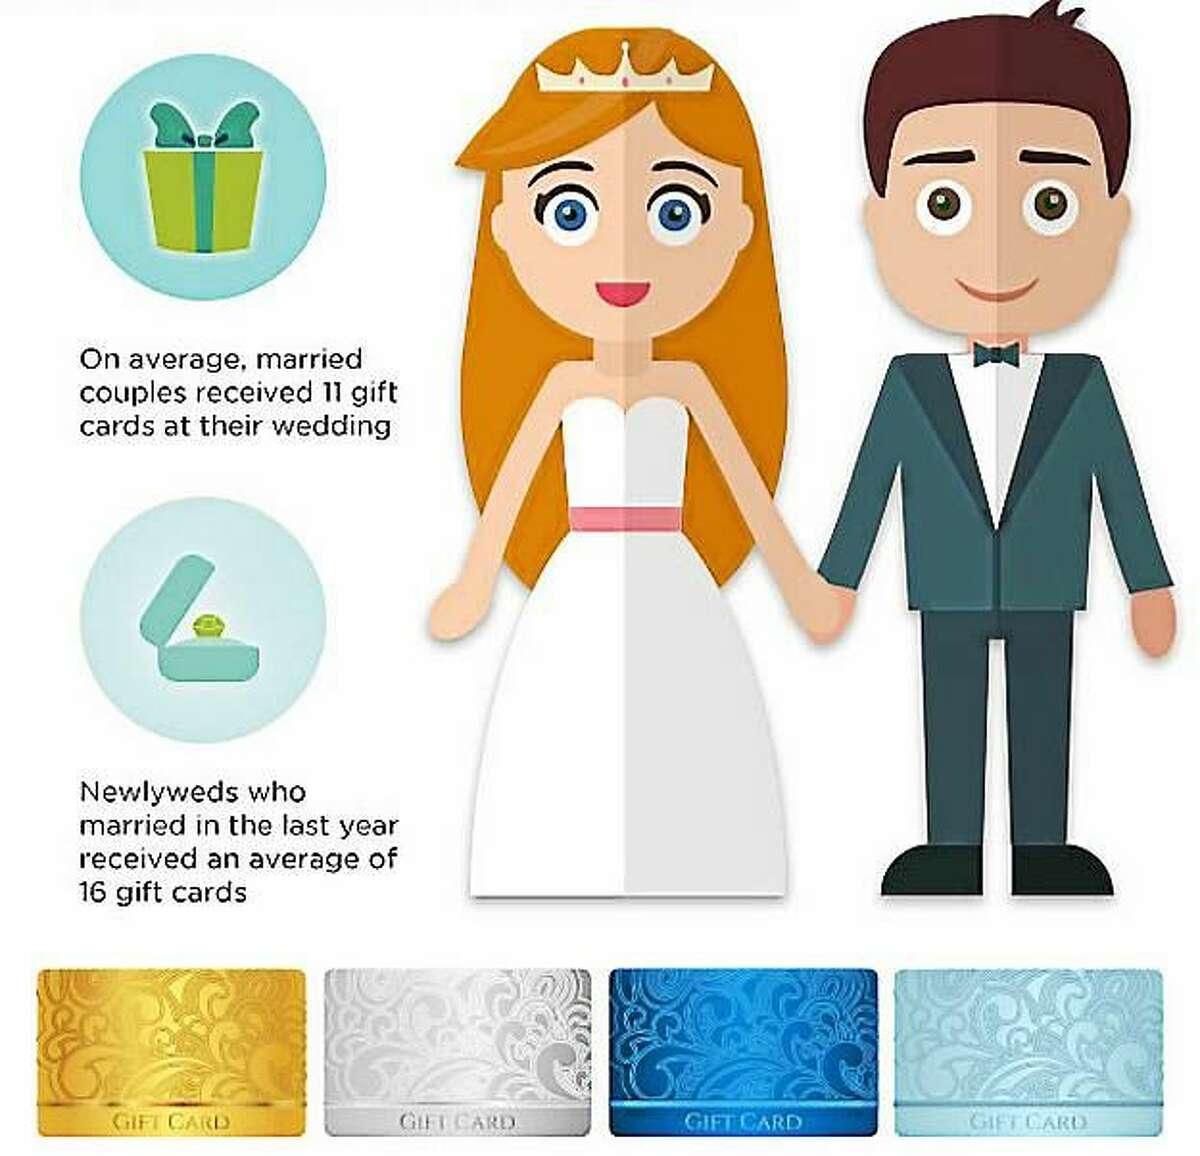 Infographic courtesy of moneytips.com